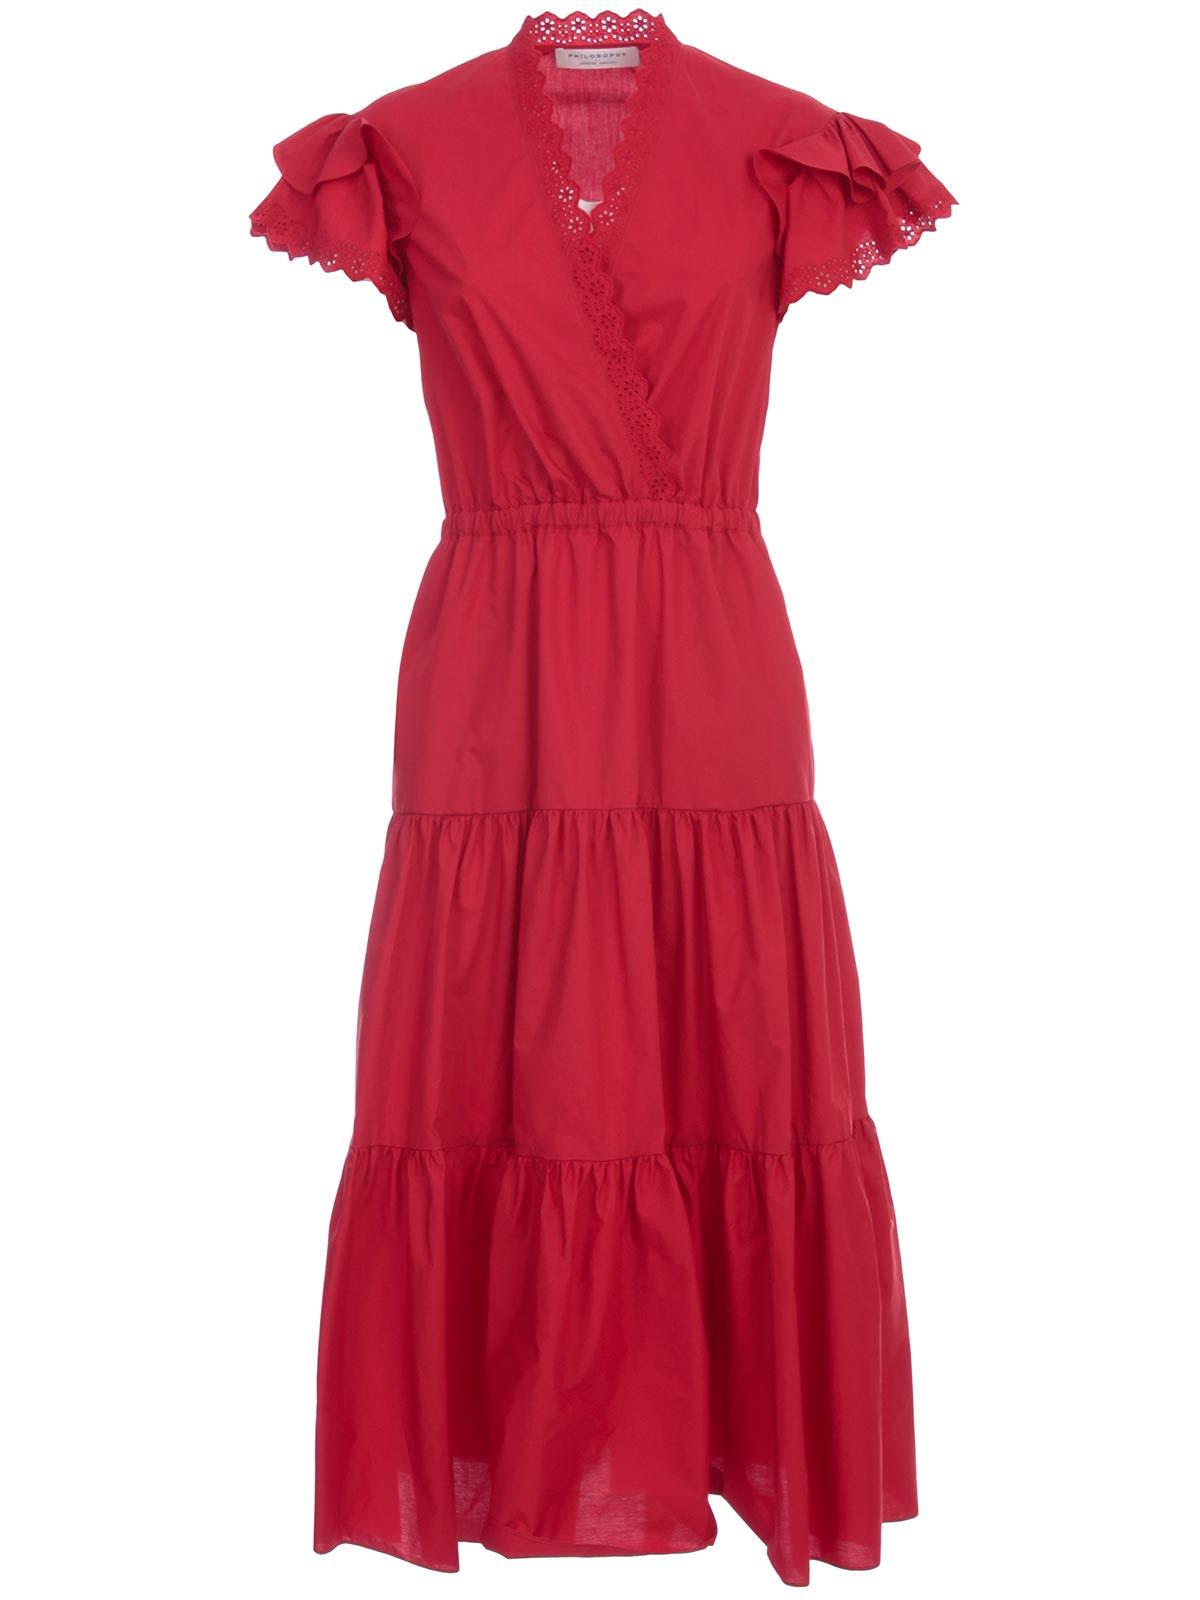 Buy Philosophy di Lorenzo Serafini Dress W/s V Neck W/flounce online, shop Philosophy di Lorenzo Serafini with free shipping